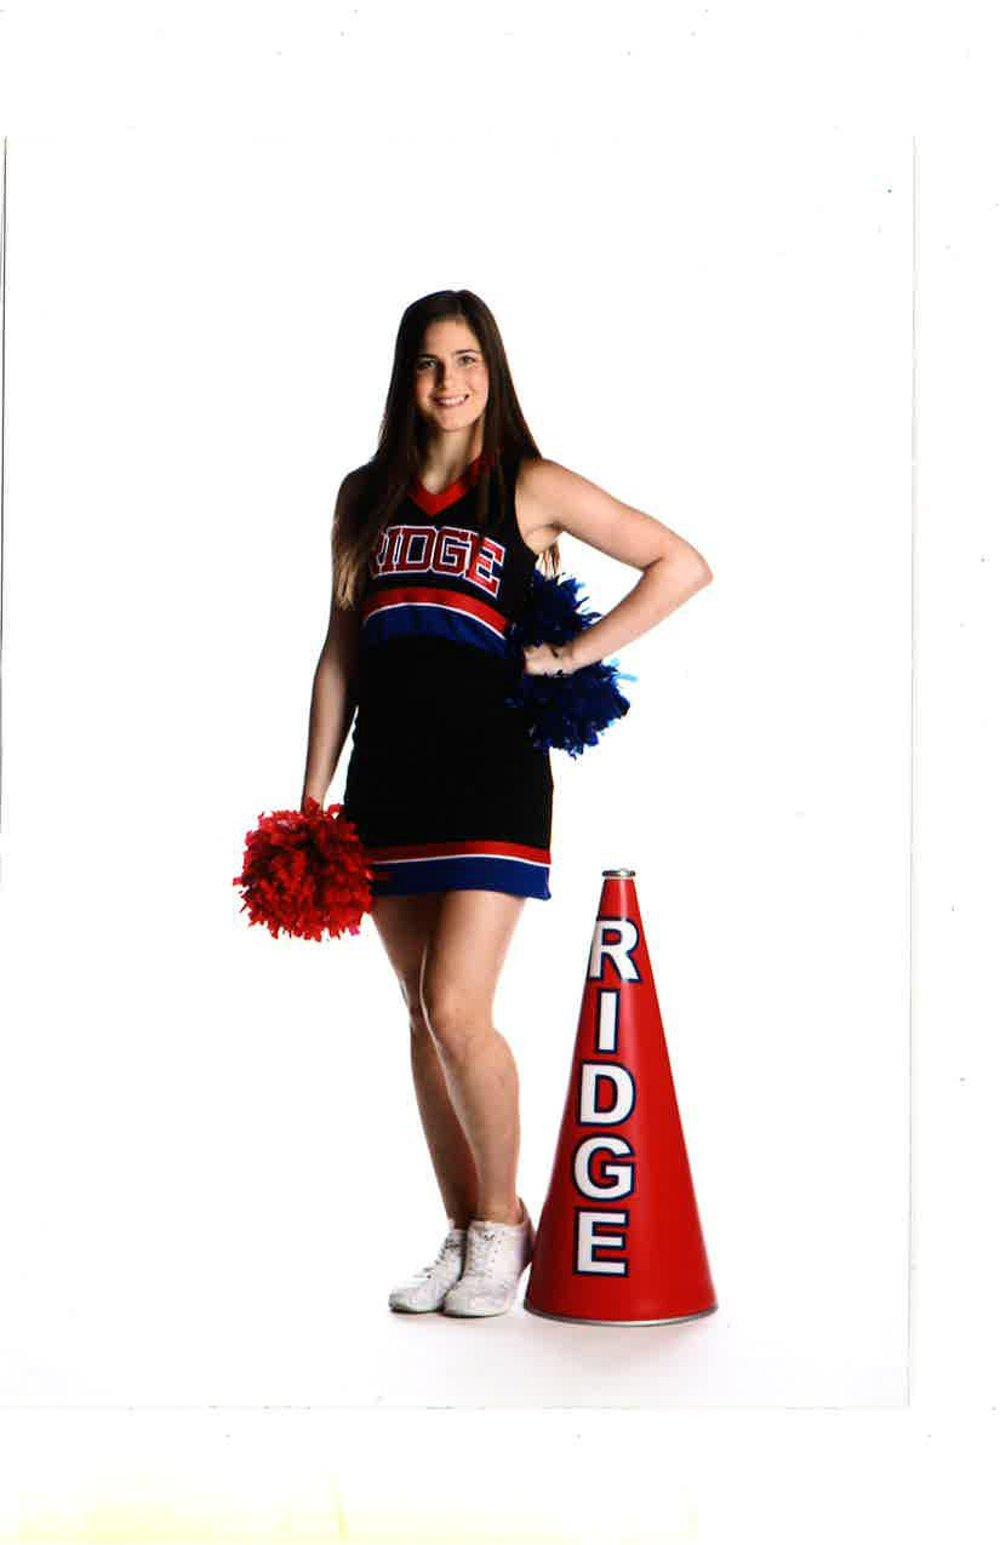 Skylar cheer photo1 (1).jpg